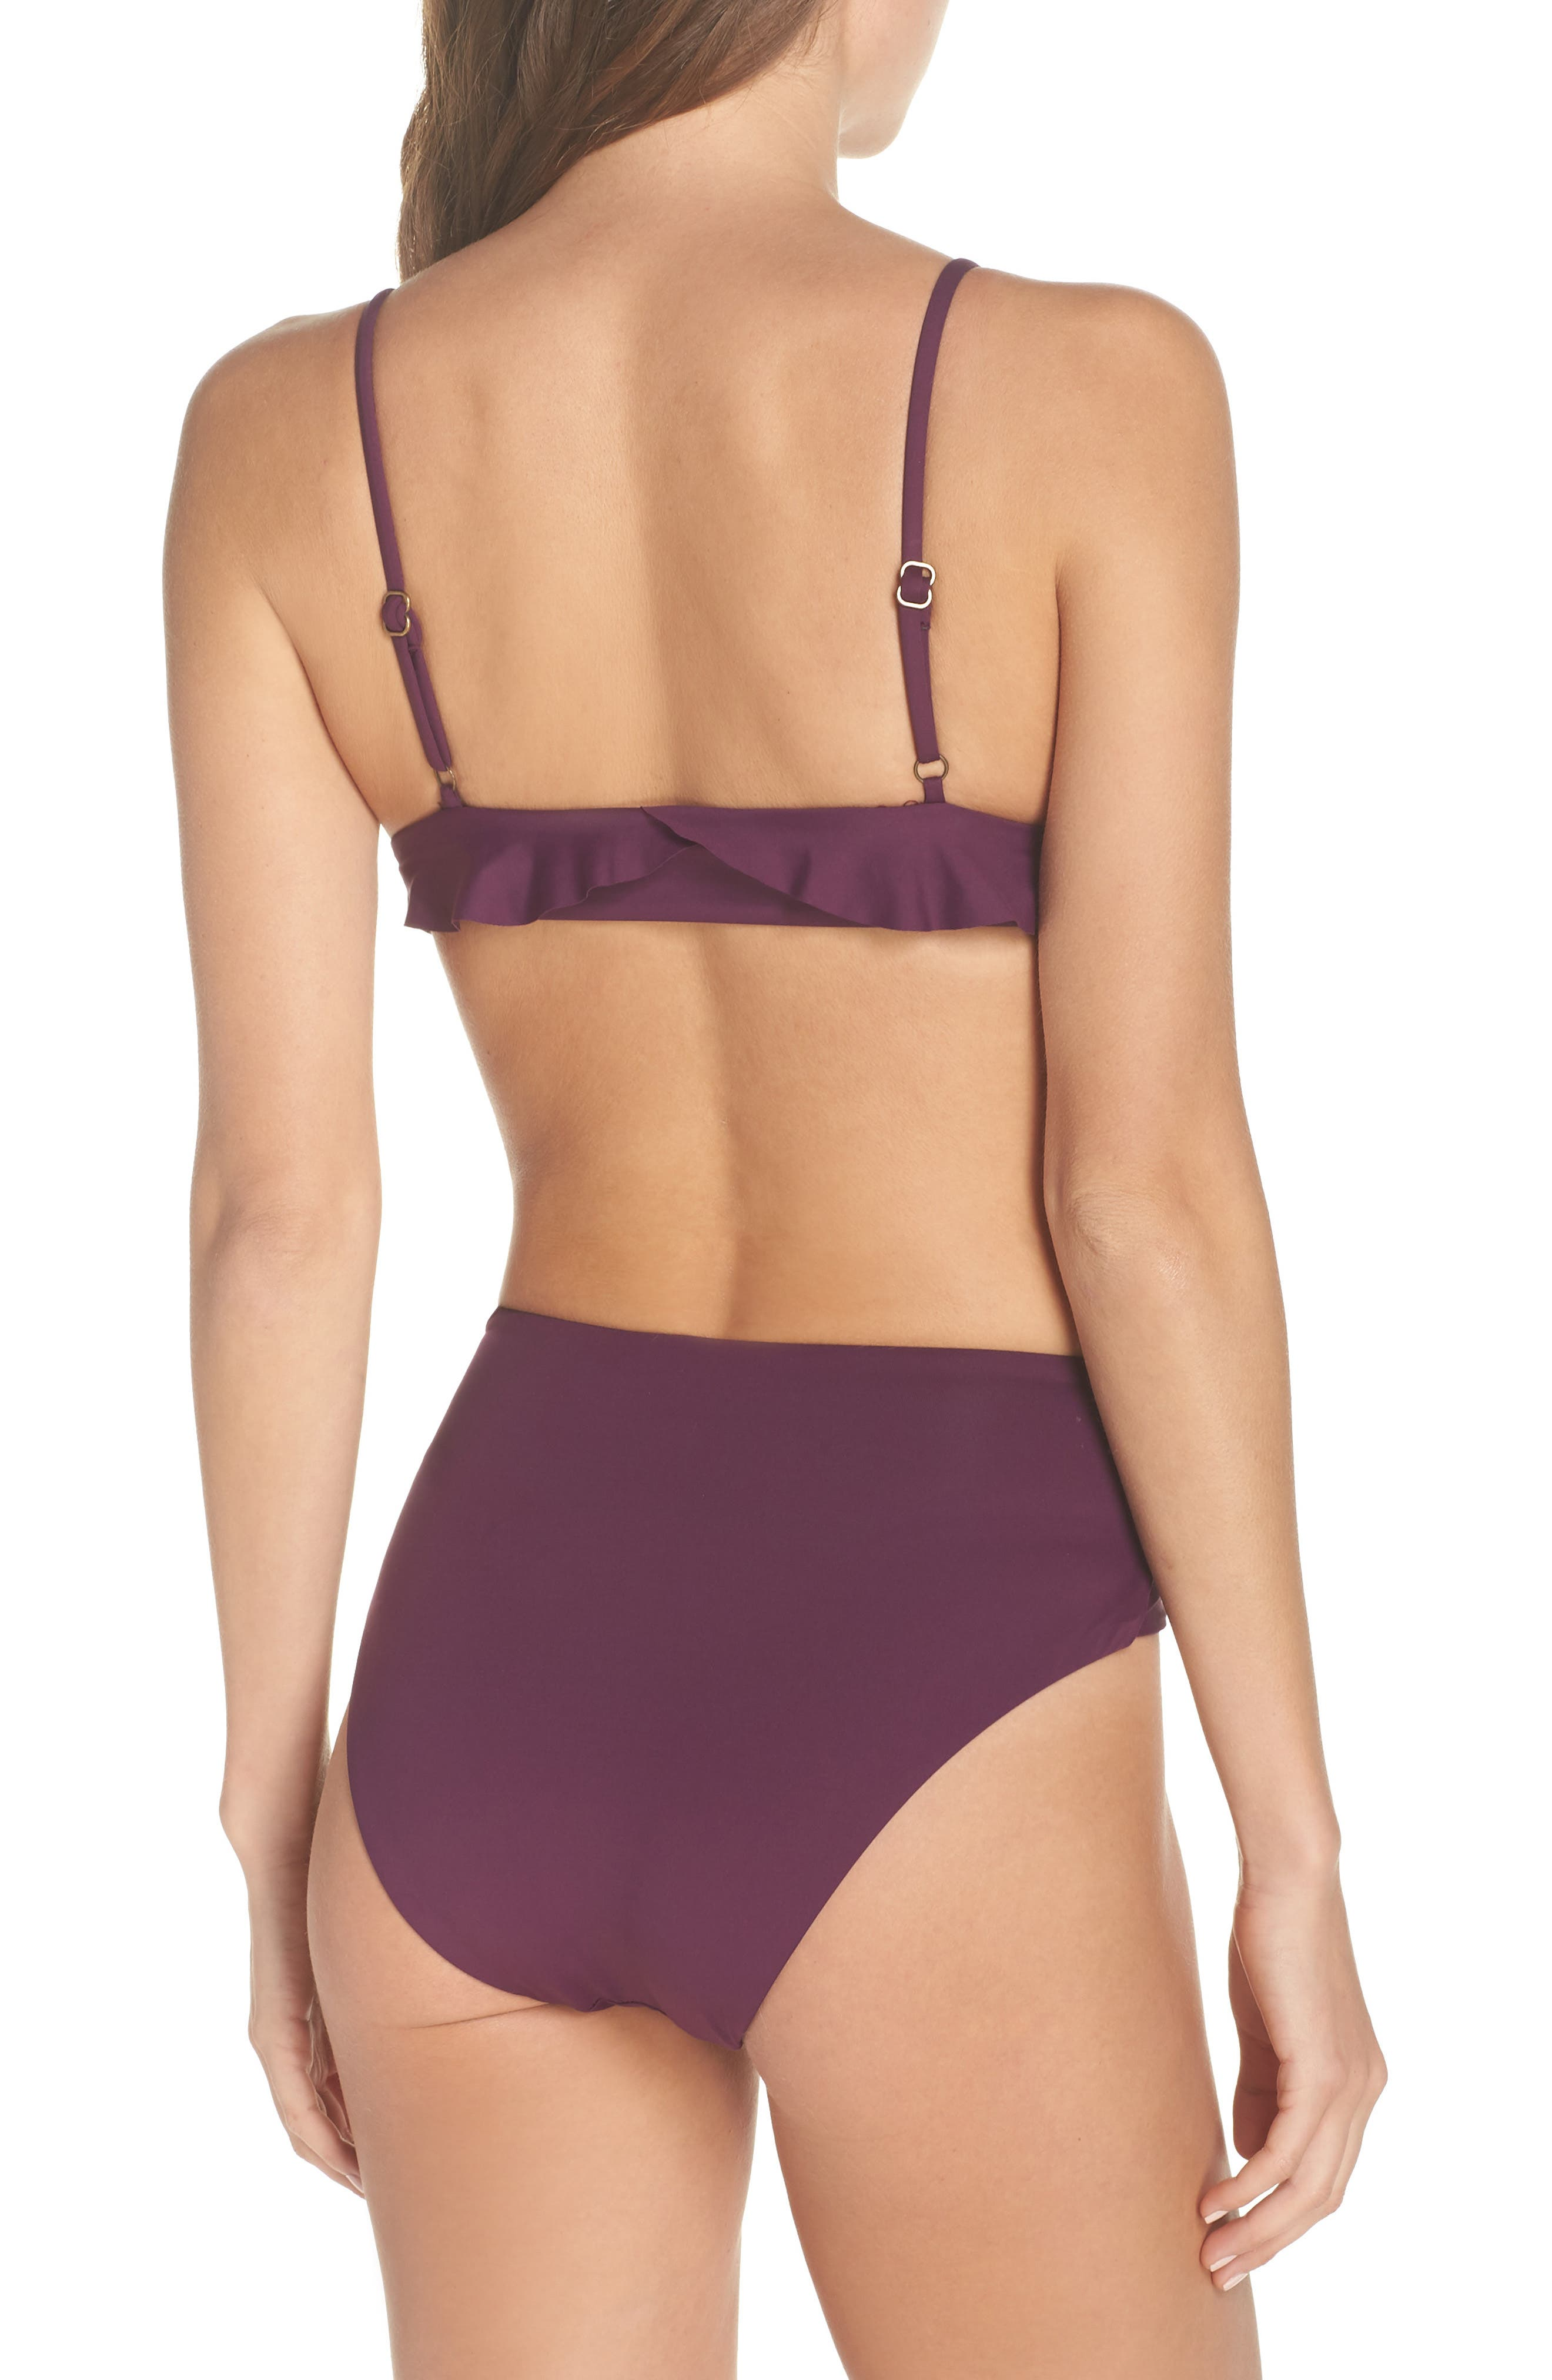 Color Code Crossover High Waist Bikini Bottoms,                             Alternate thumbnail 8, color,                             MERLOT